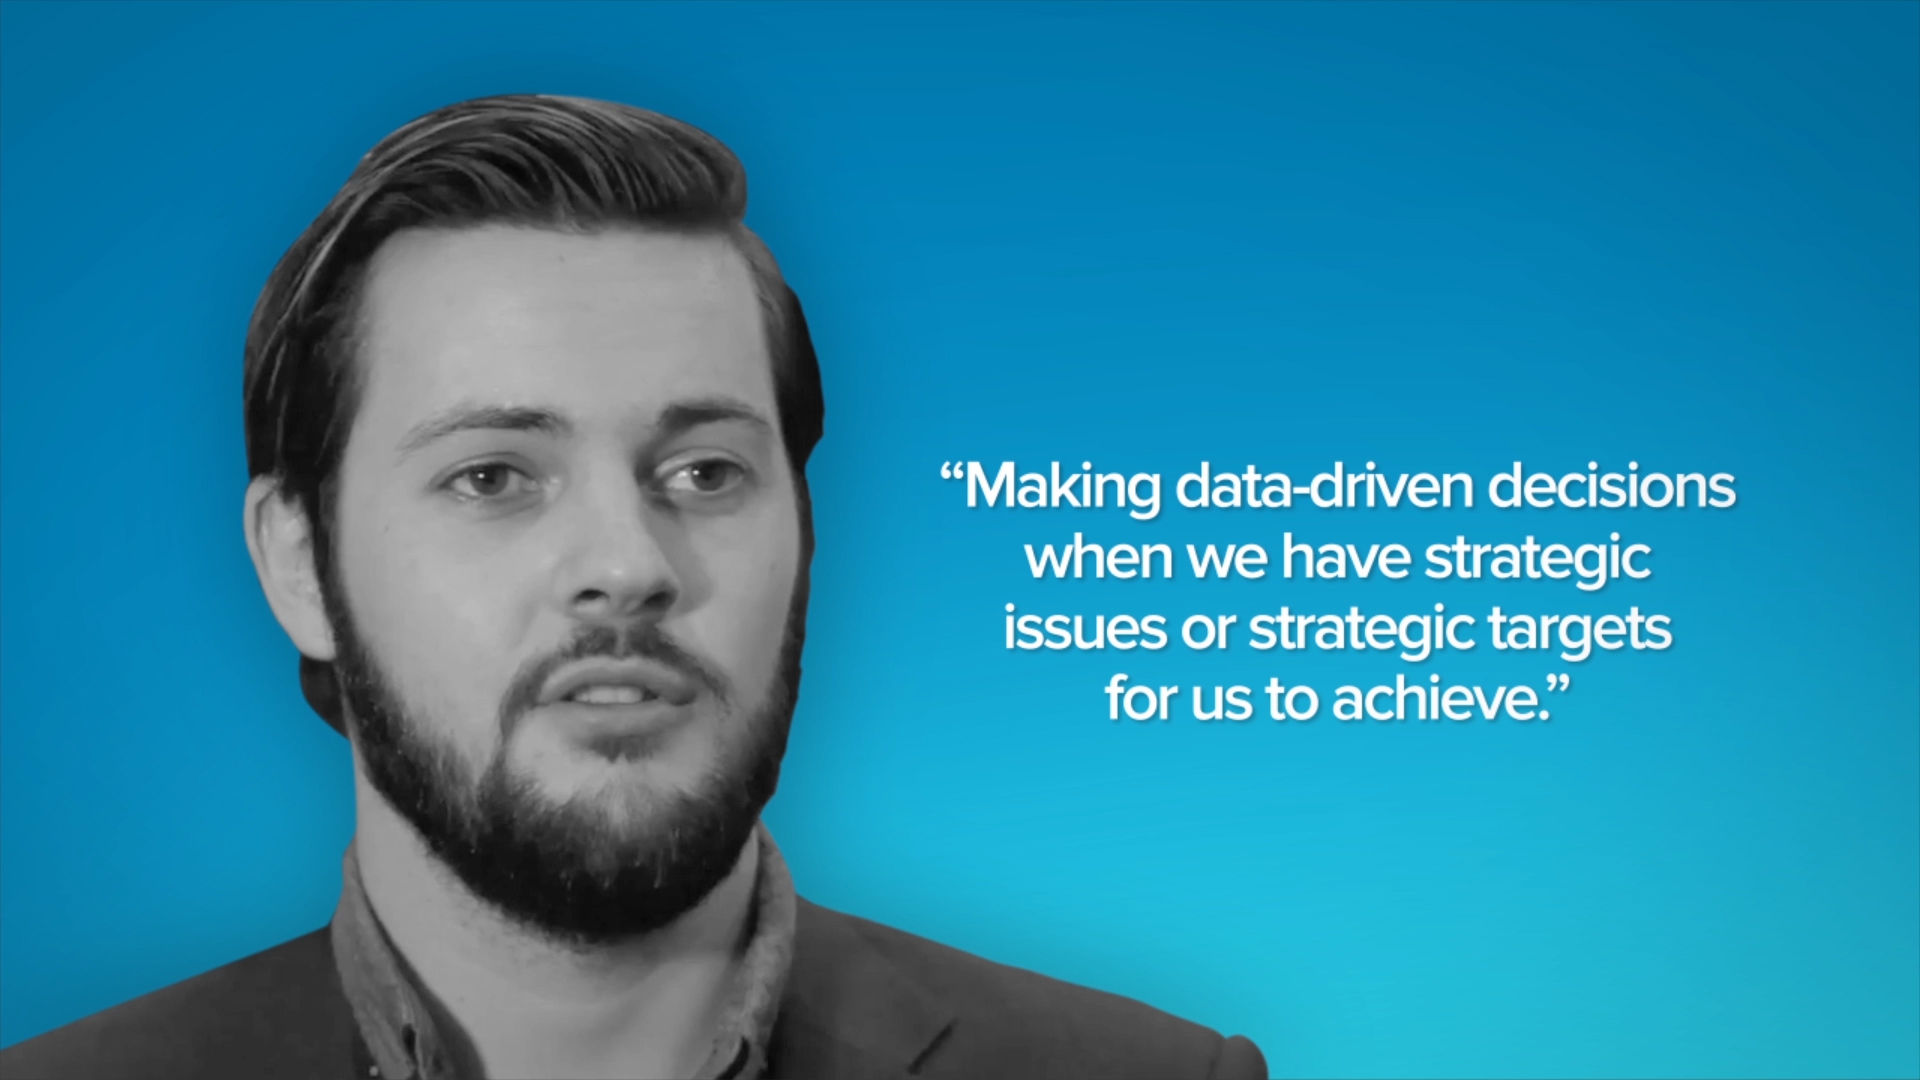 Optimizely: Leveraging Data